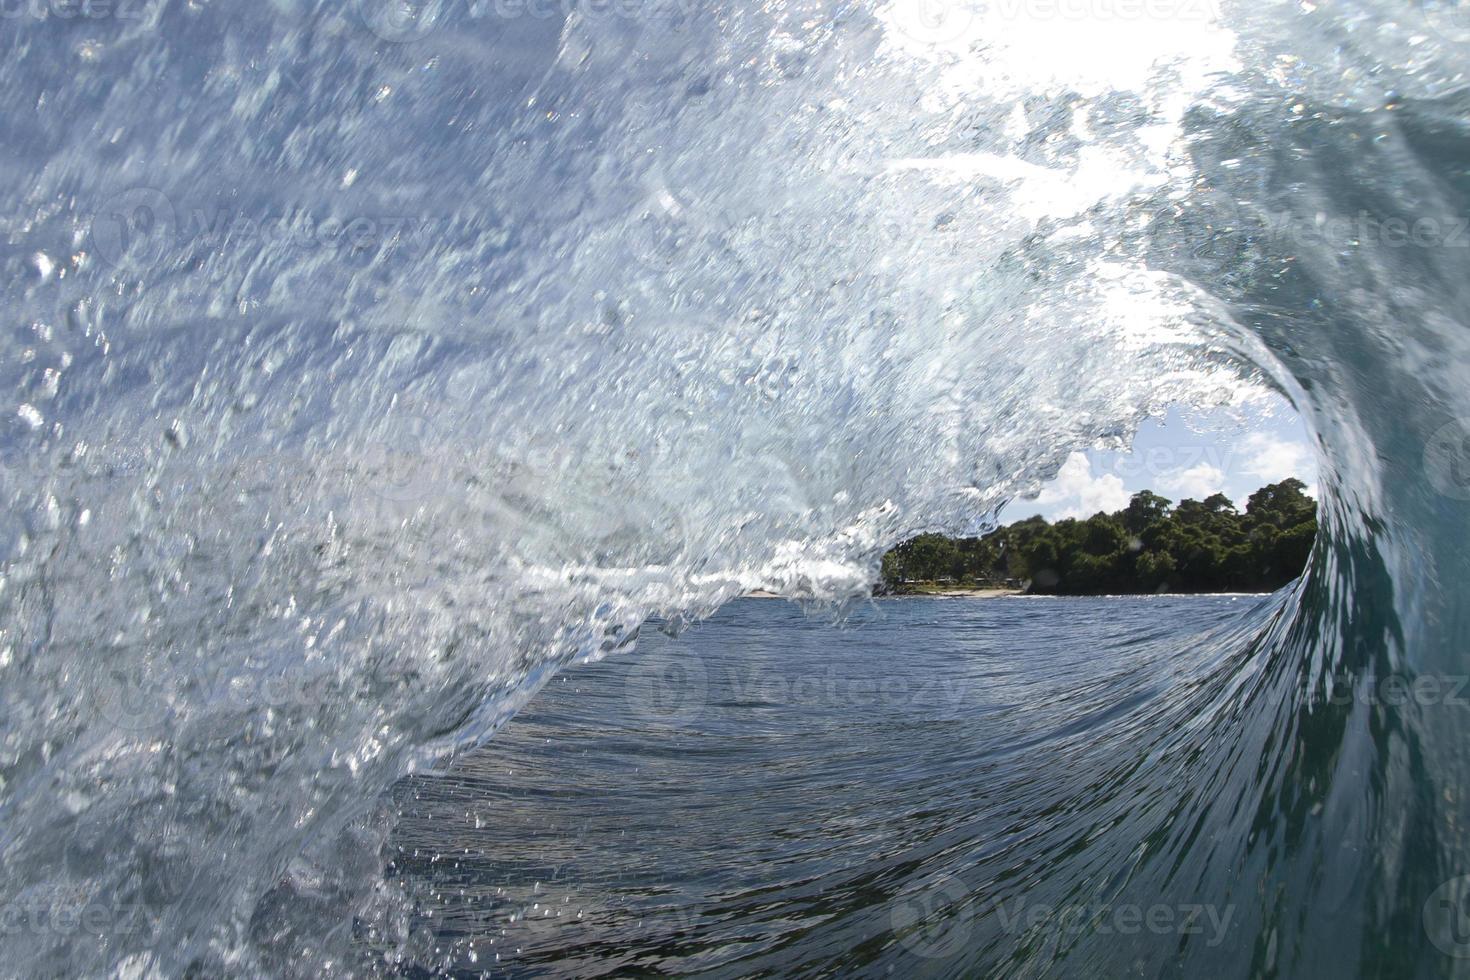 vague samoane photo